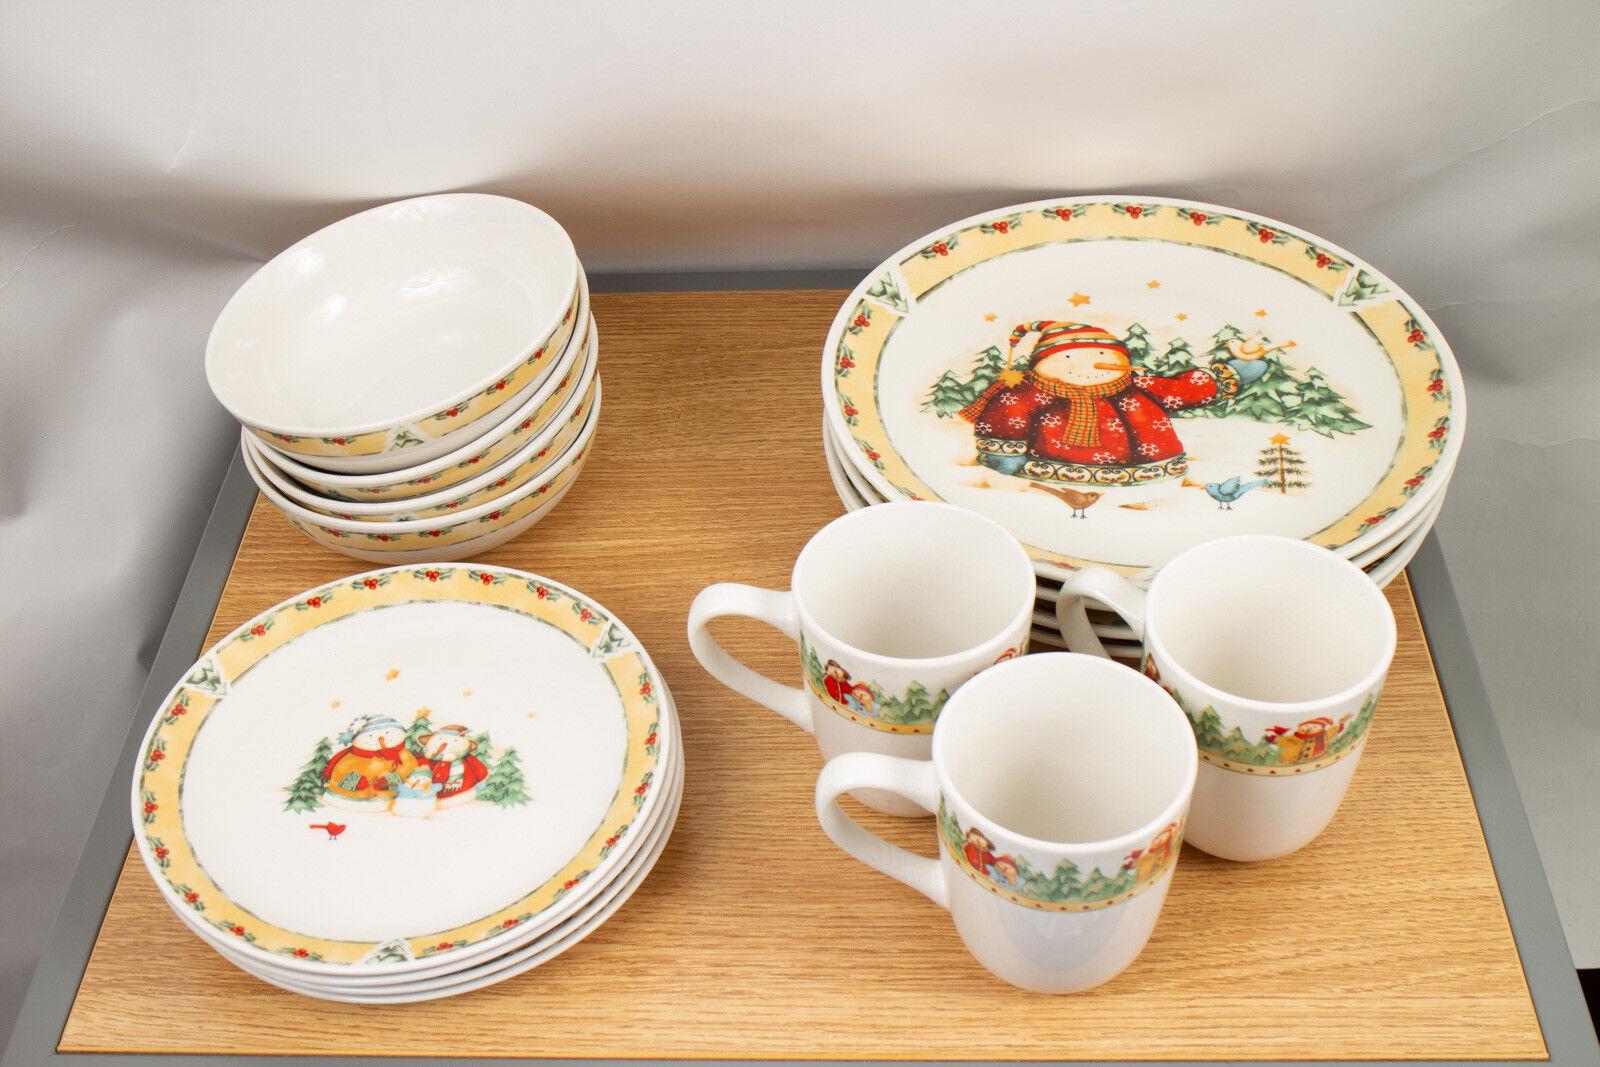 Target Home Brand Stoneware Christmas Dish Set - Snowman Frolic 15 Piece Set